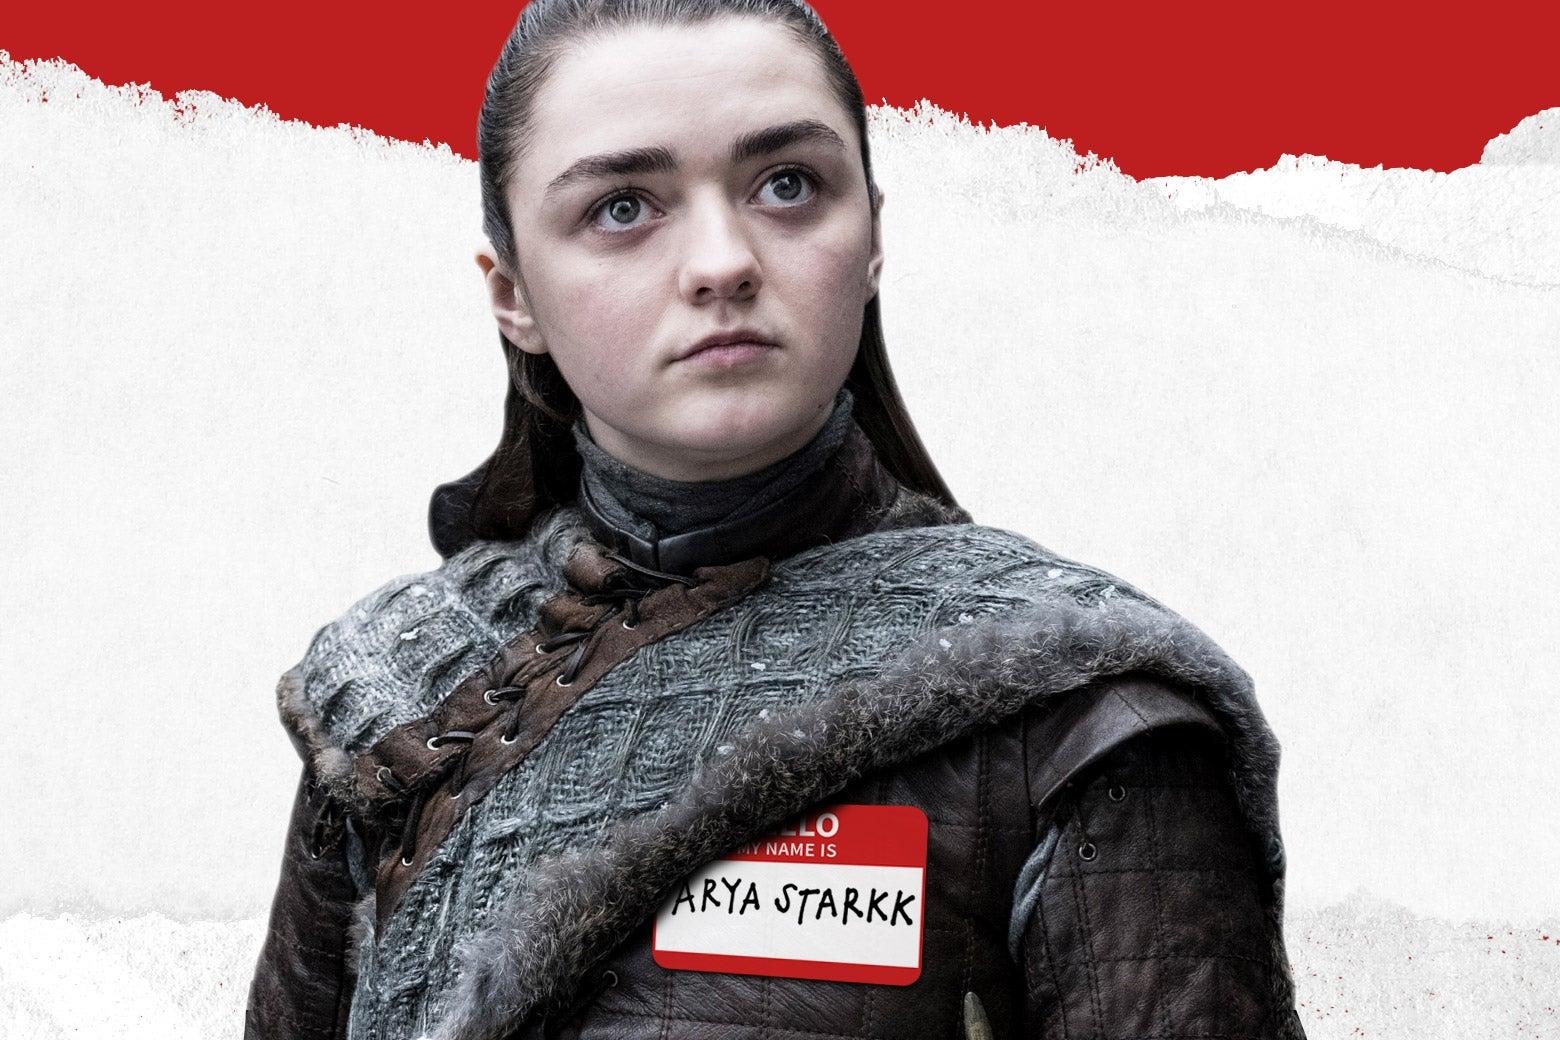 Arya Stark wearing a nametag.